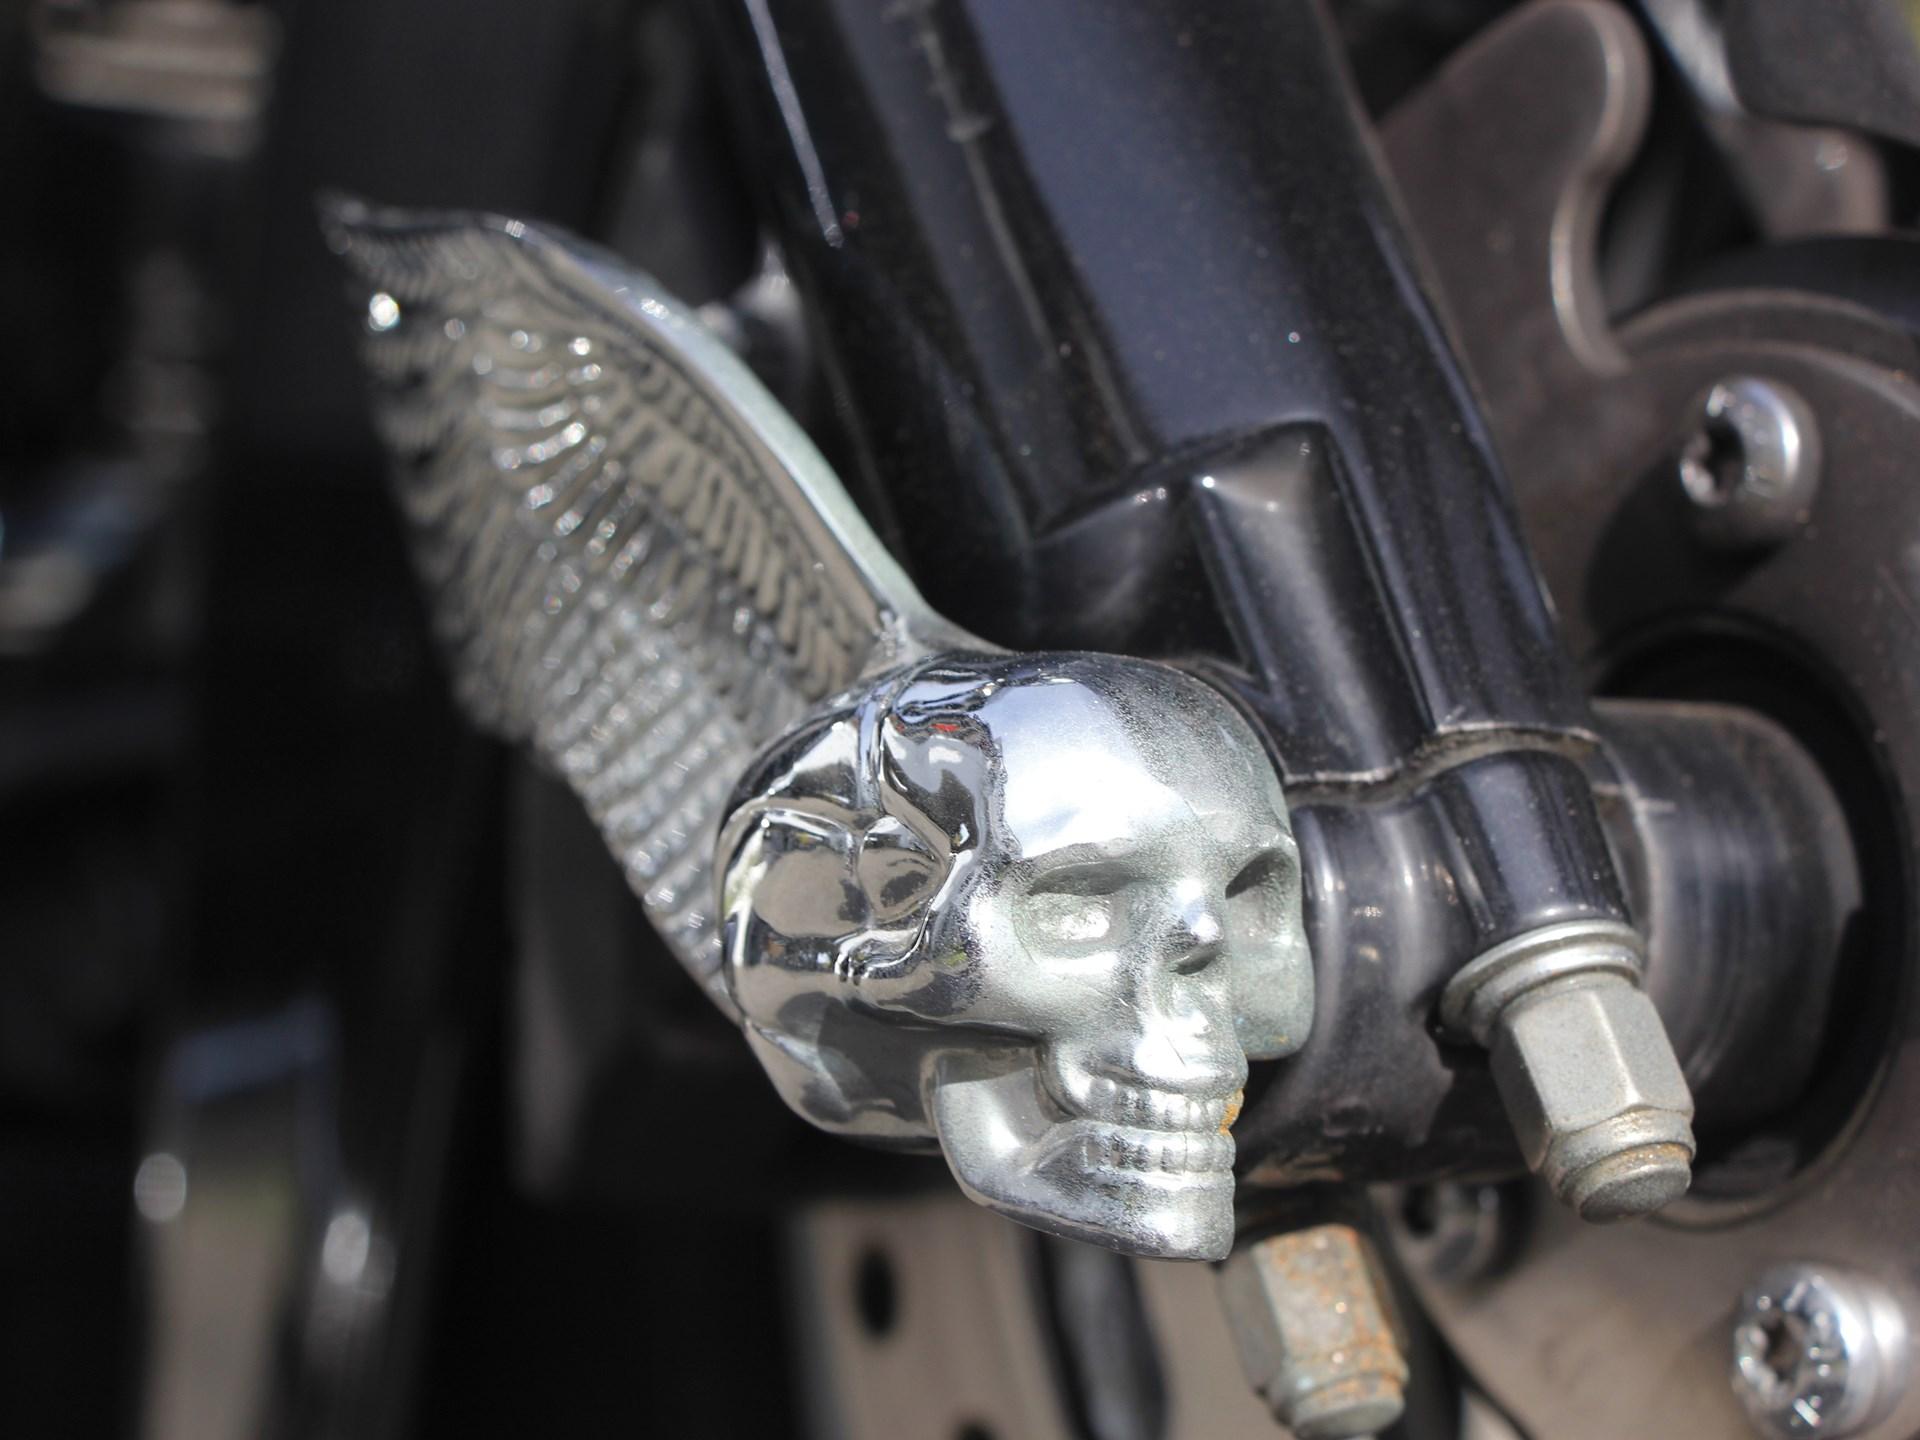 2010 Harley-Davidson FLHXXX Street Glide Trike